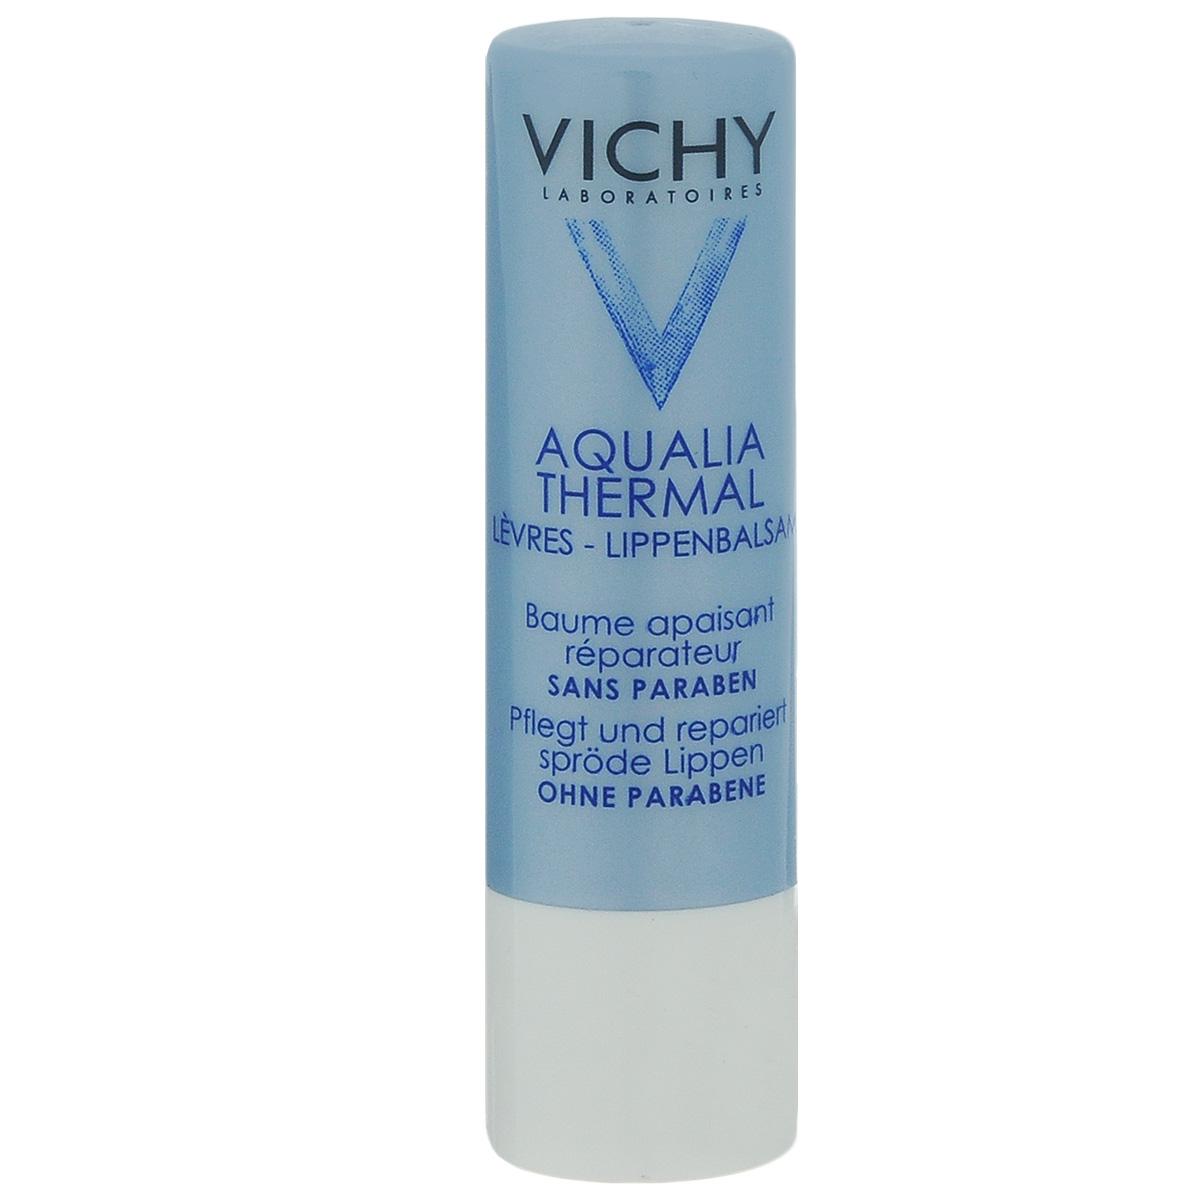 Vichy Aqualia Thermal Увлажняющий и восстанавливающий бальзам для губ Aqualia Thermal, 5 мл vichy увлажняющий спрей активатор для тела capital ideal soleil spf30 200мл пляжная сумка в подарок